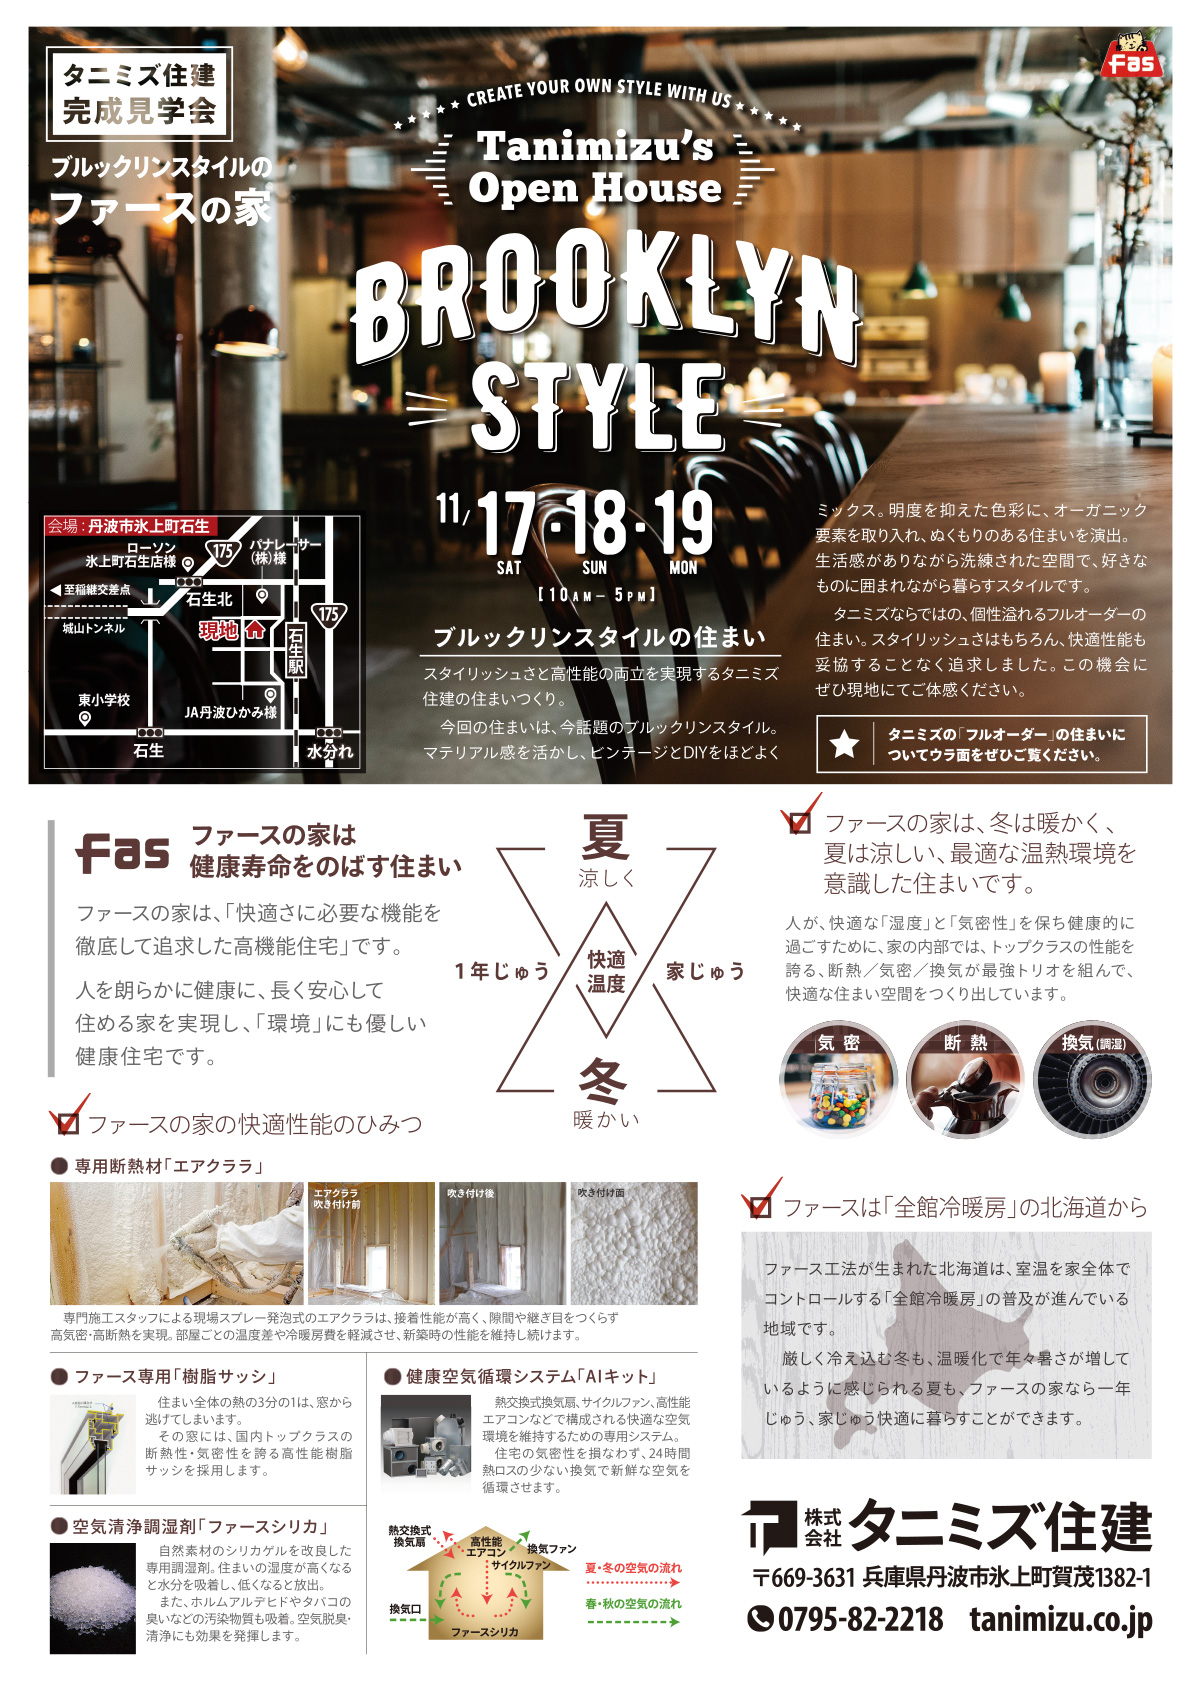 tanimizu-flyer-vertical-2018-11-16-omote.jpg